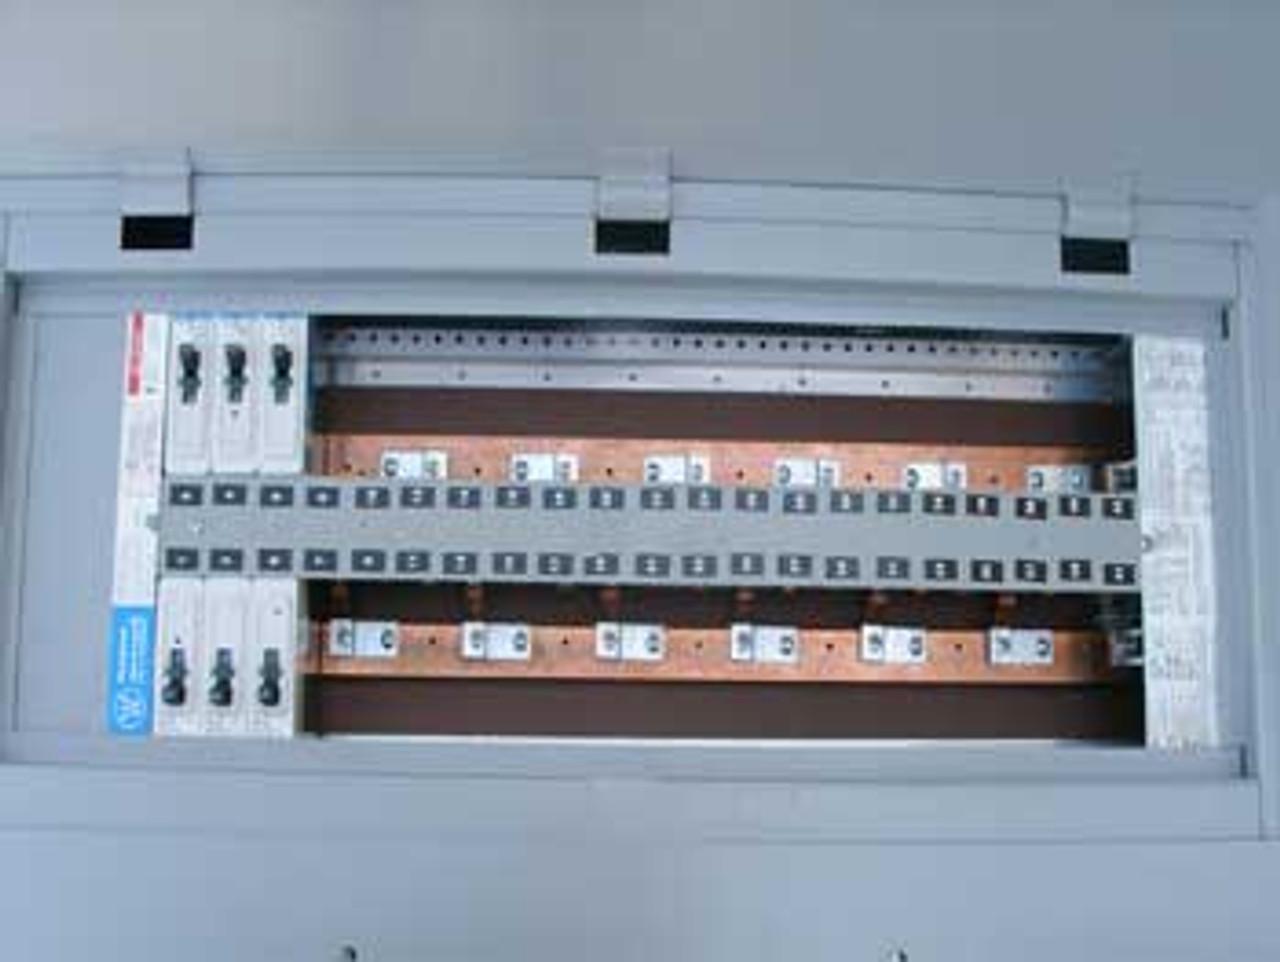 Westinghouse YS2054 PRL 3 225 Amp MLO 480Y/277V 3 PH 4W Panel Board - Used